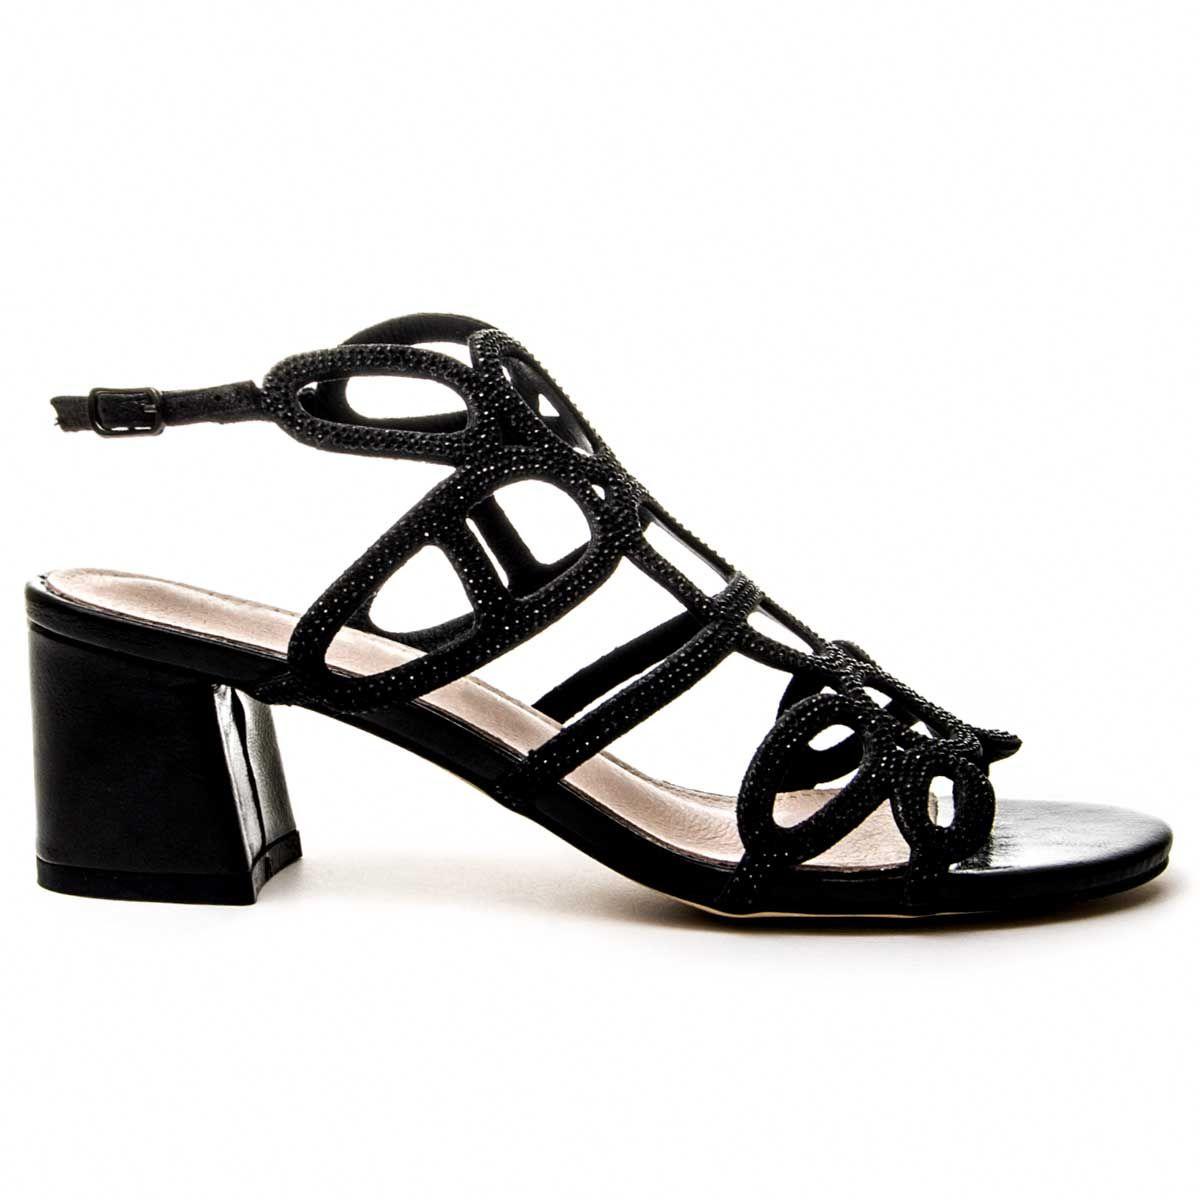 Montevita Block Heel Sandal in Black